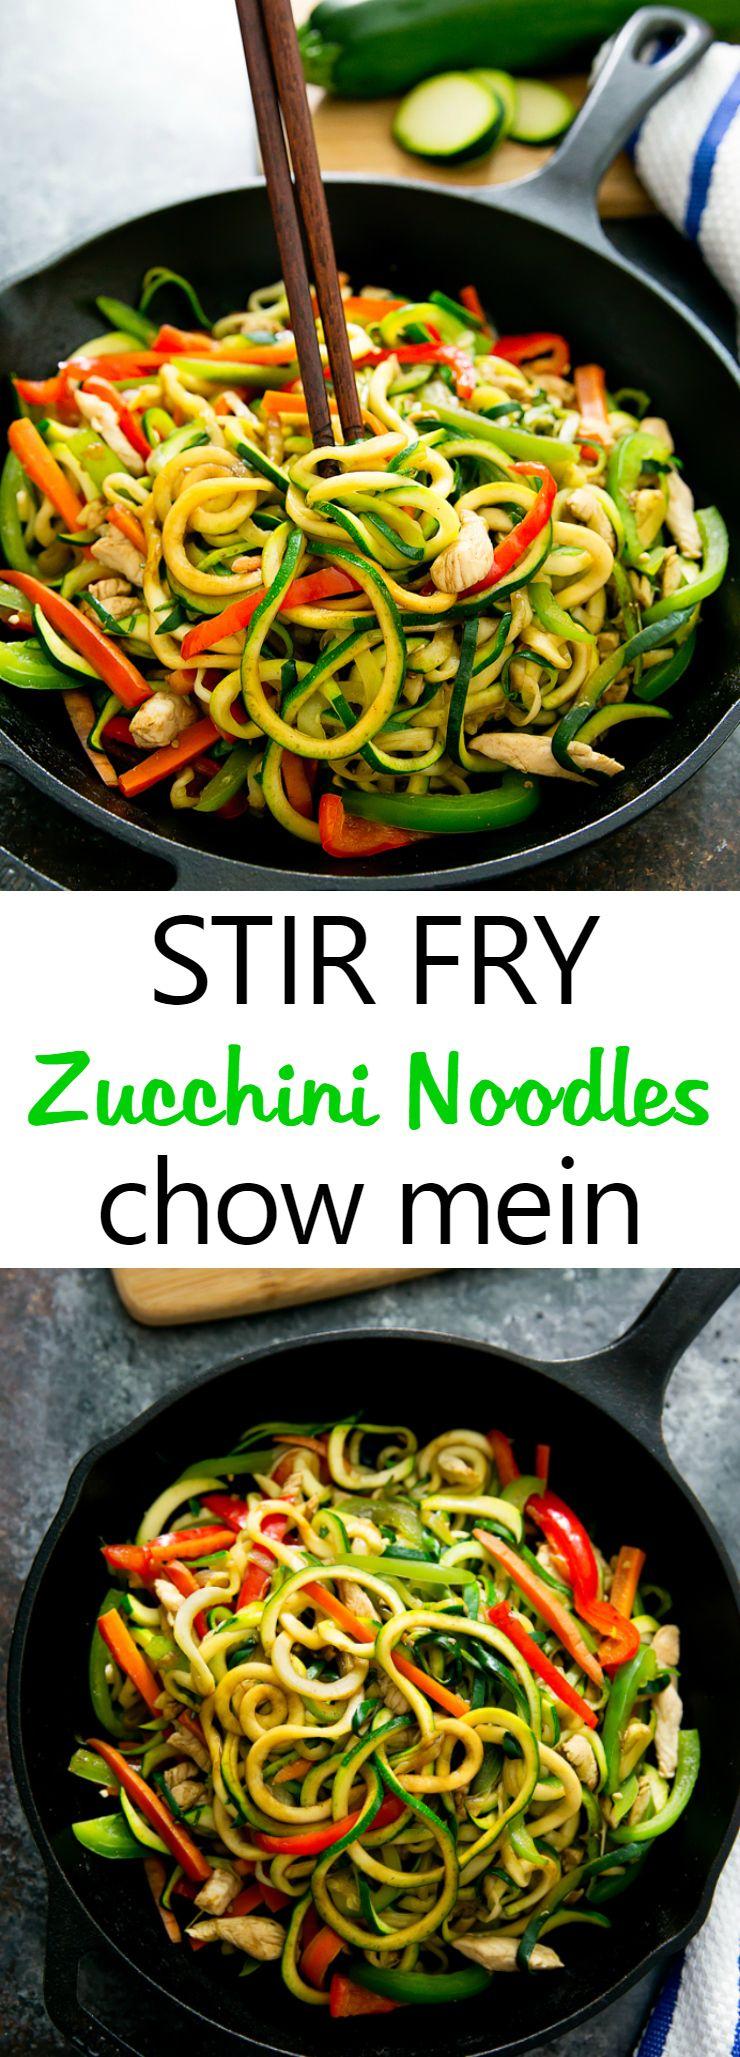 Photo of Stir Fry Zucchini Noodles Chow Mein